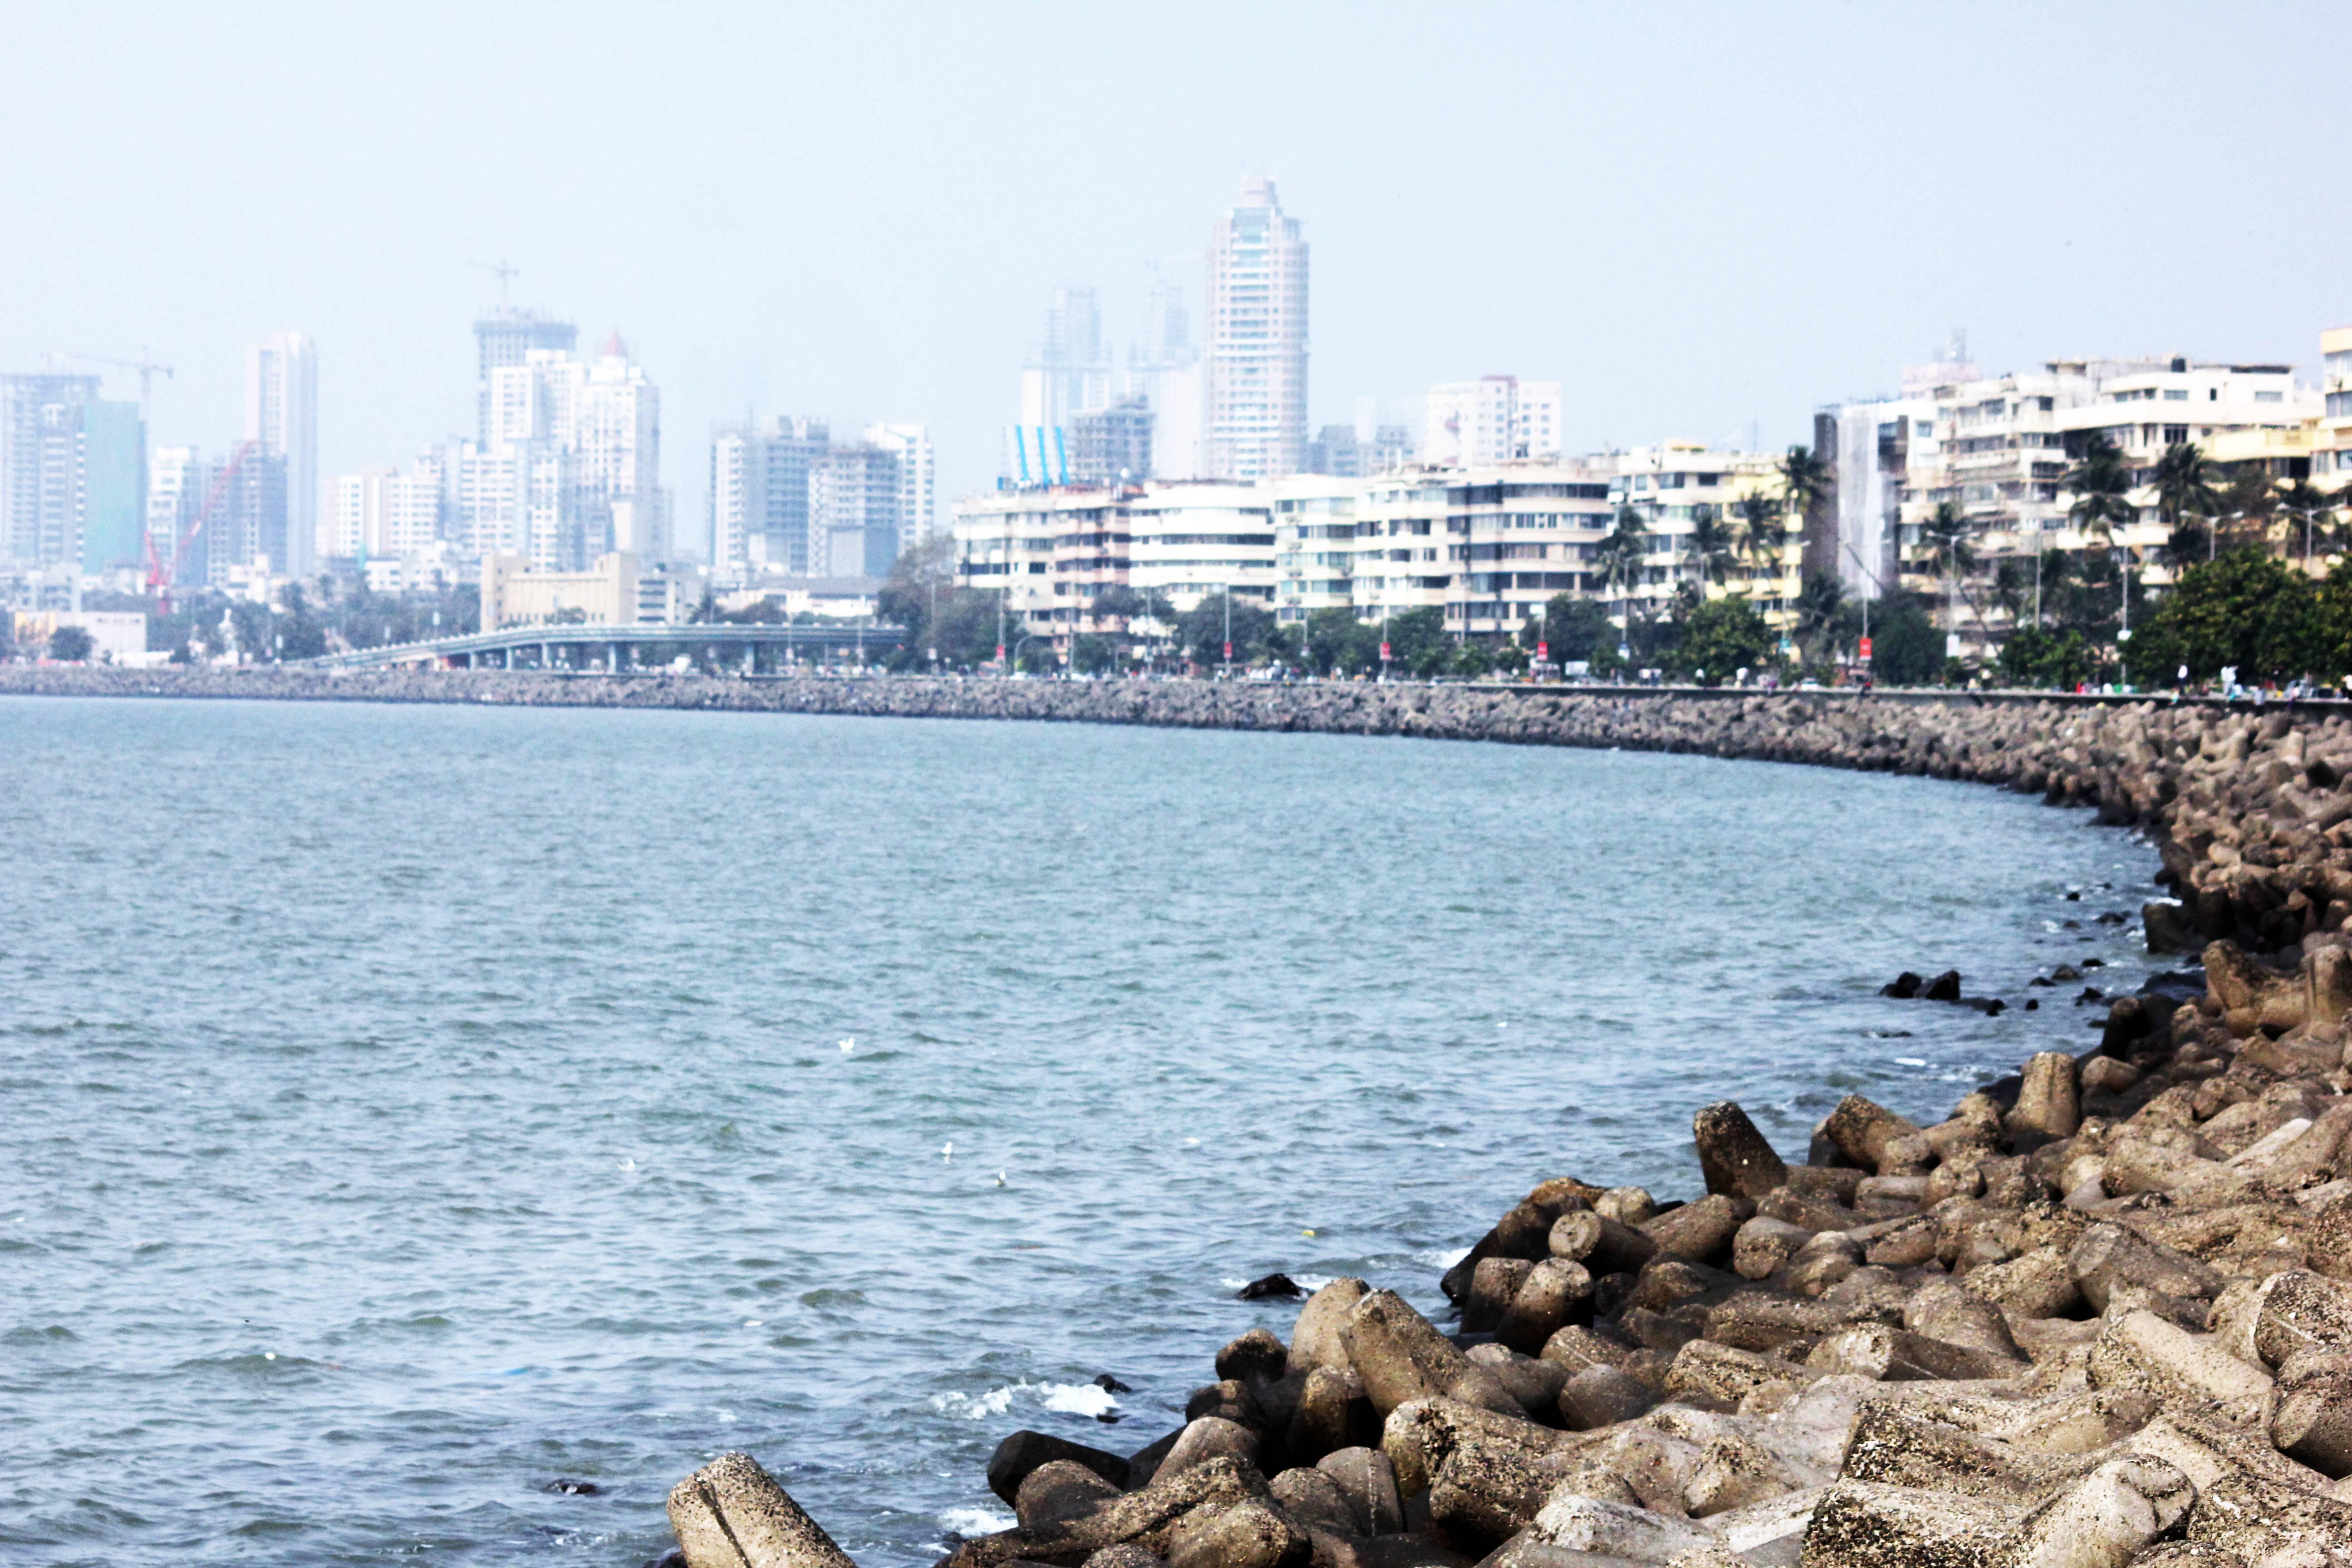 File:Marine Drive Queens Necklace Mumbai.jpg